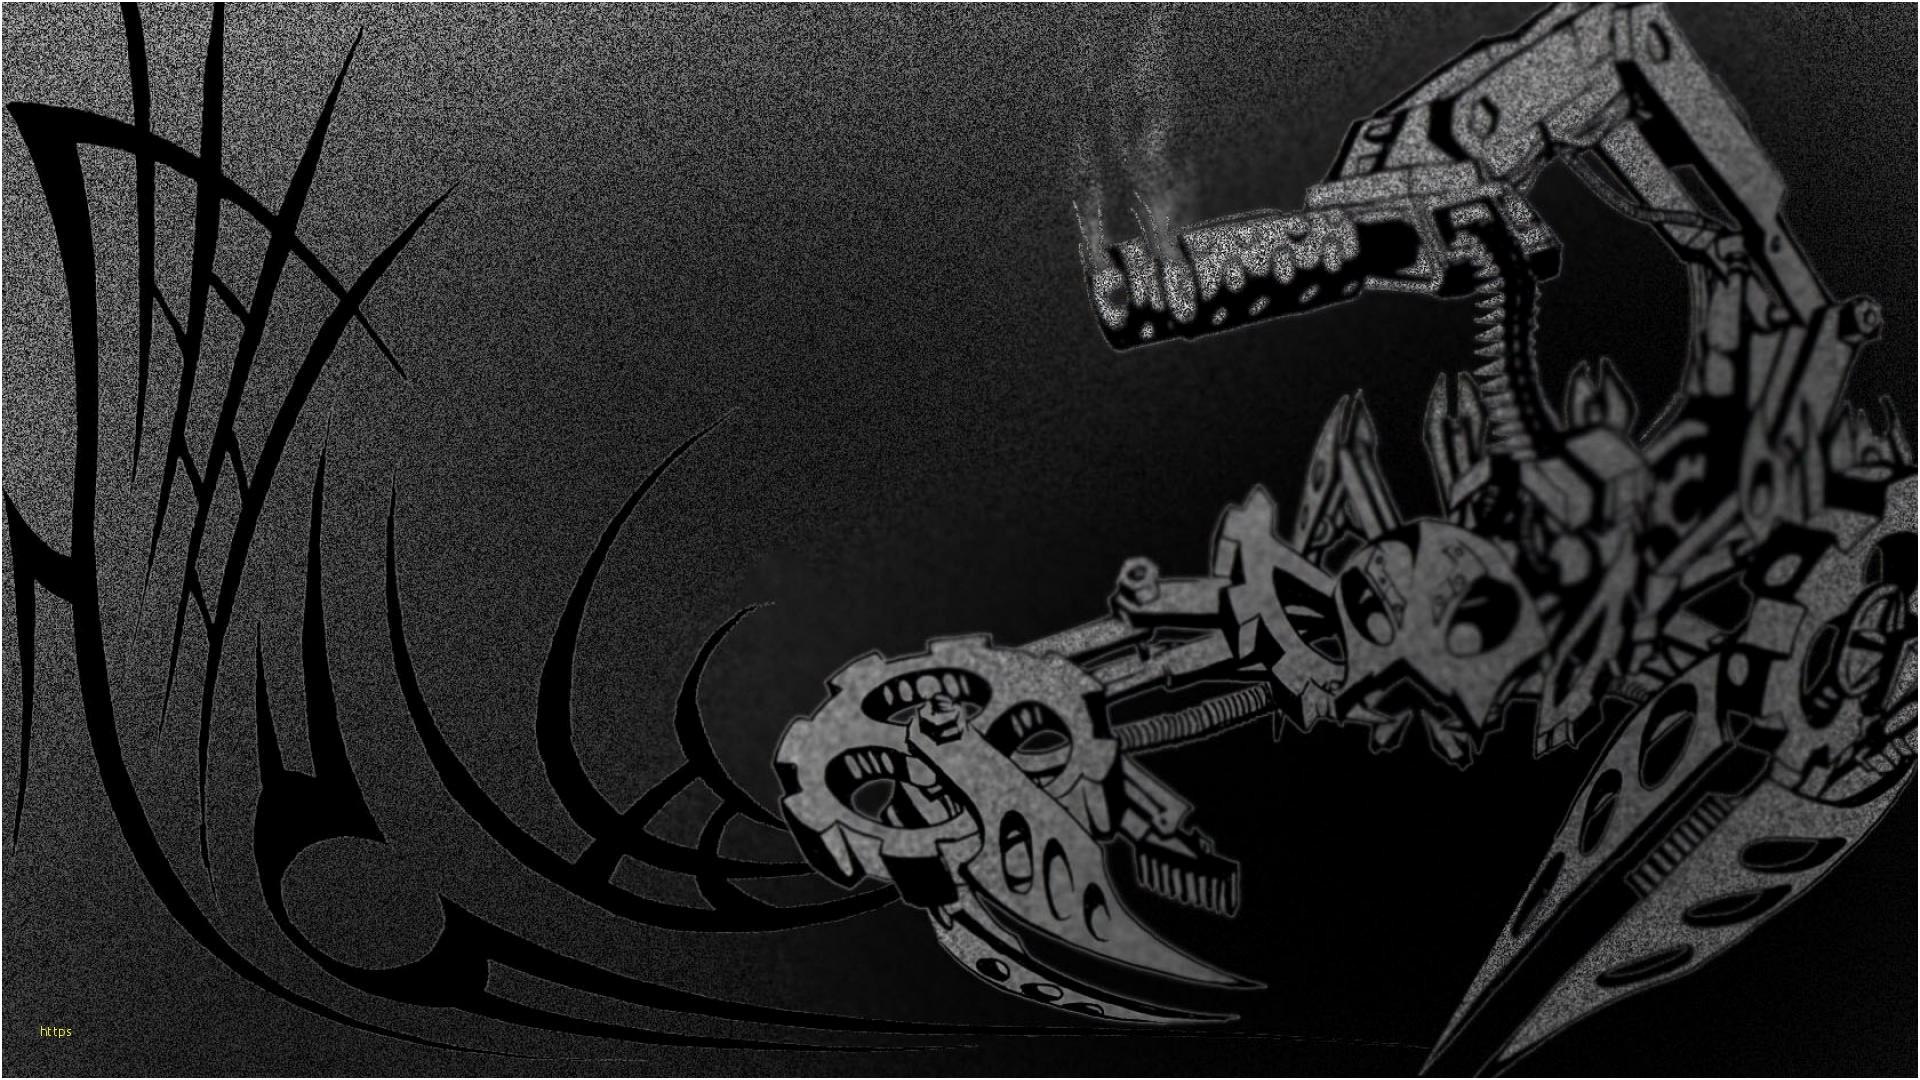 Res: 1920x1080, Scorpion Wallpaper Inspirational Scorpion Hd Desktop Wallpapers